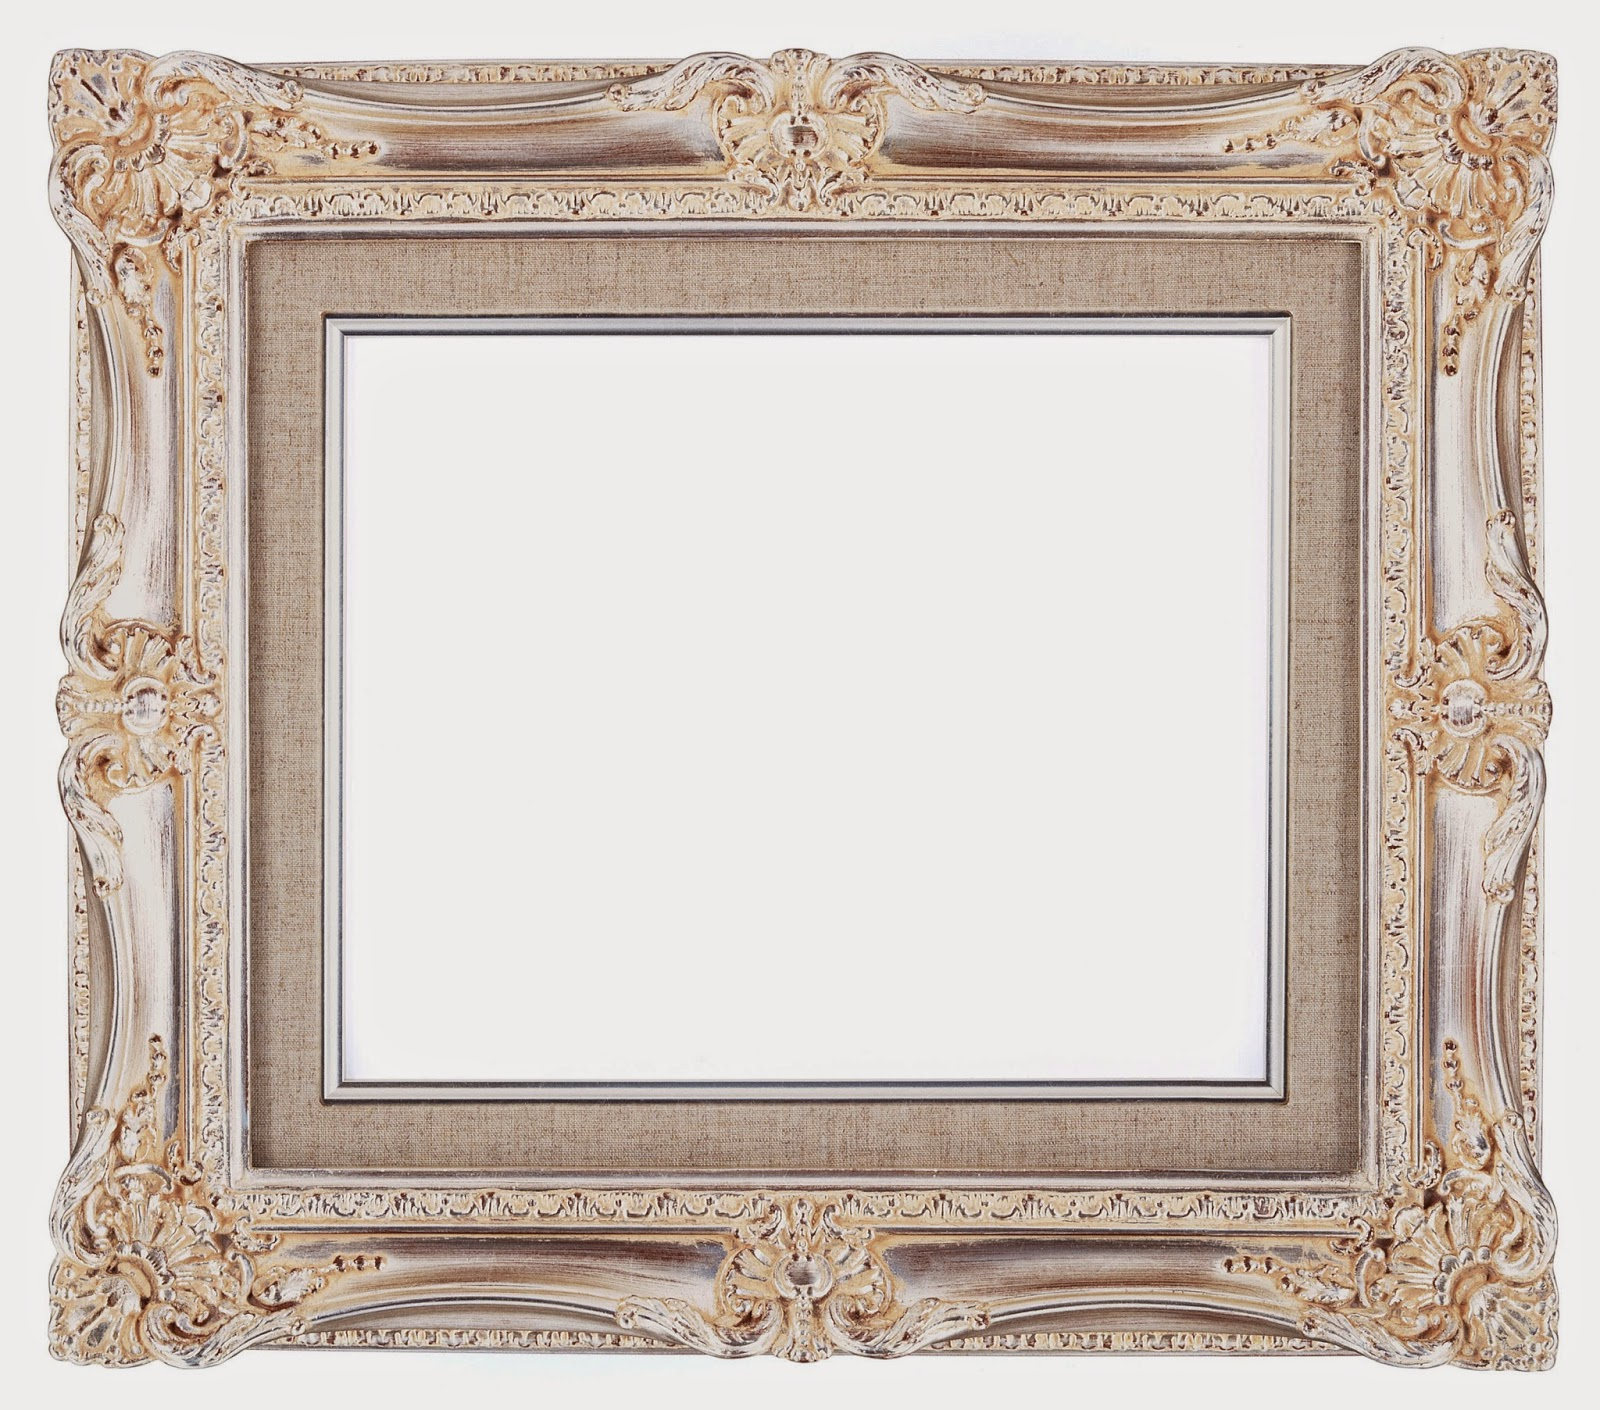 Stupendous image inside printable photo frames